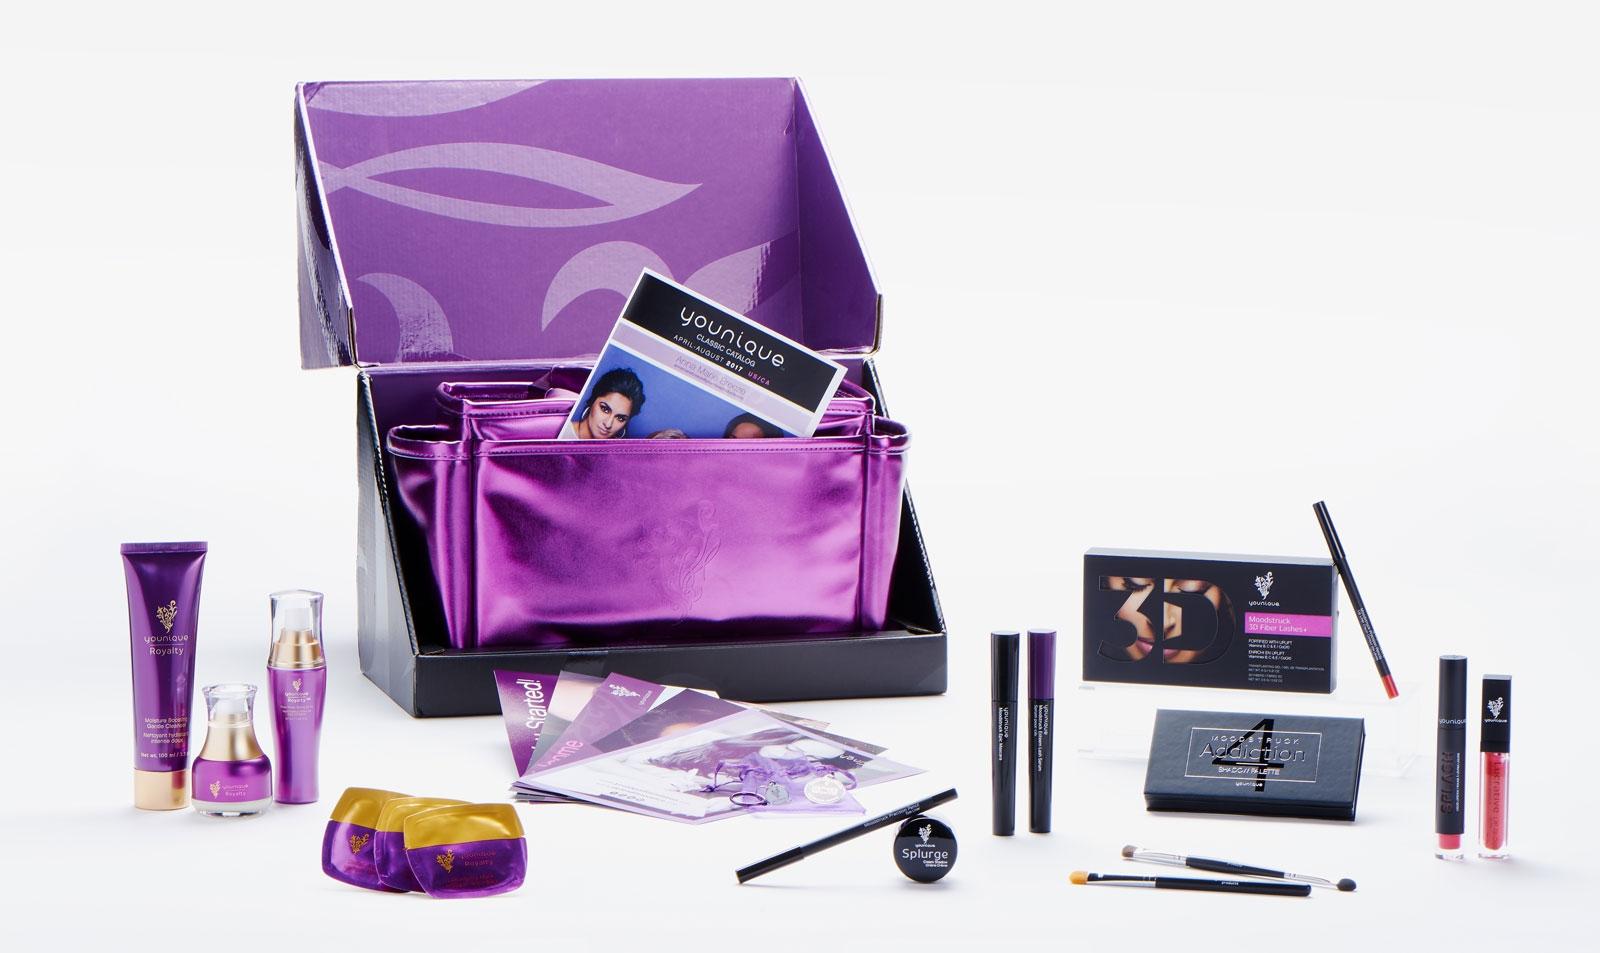 July August September 2017 Younique Presenter Starter Kit